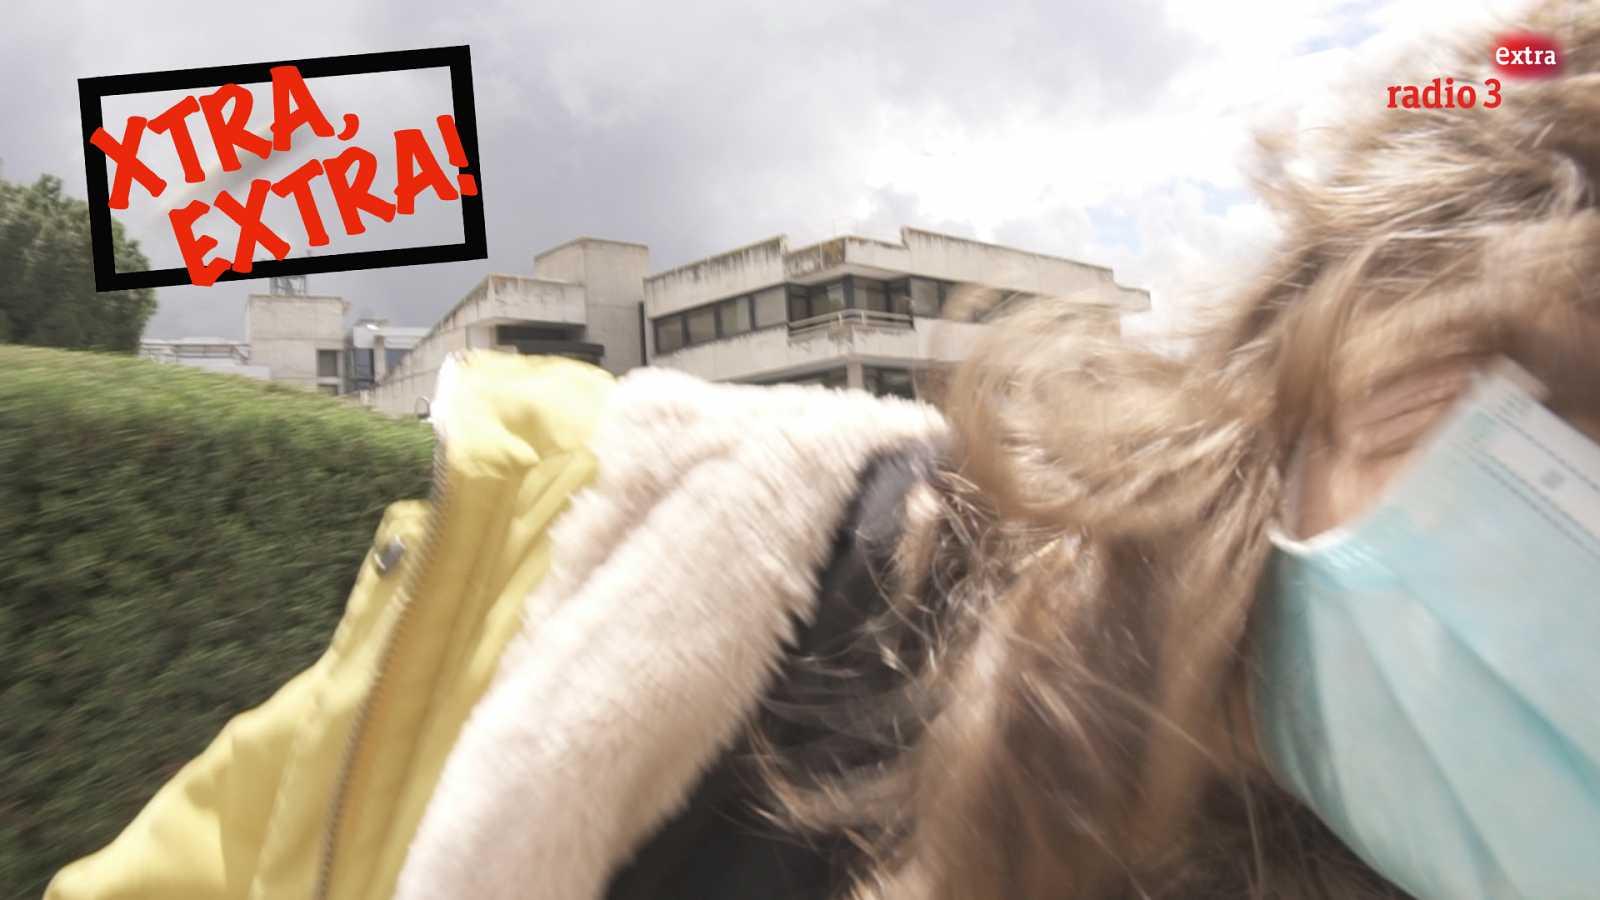 Xtra, Extra! - El ataque de la abeja - 30/04/21 - ver ahora